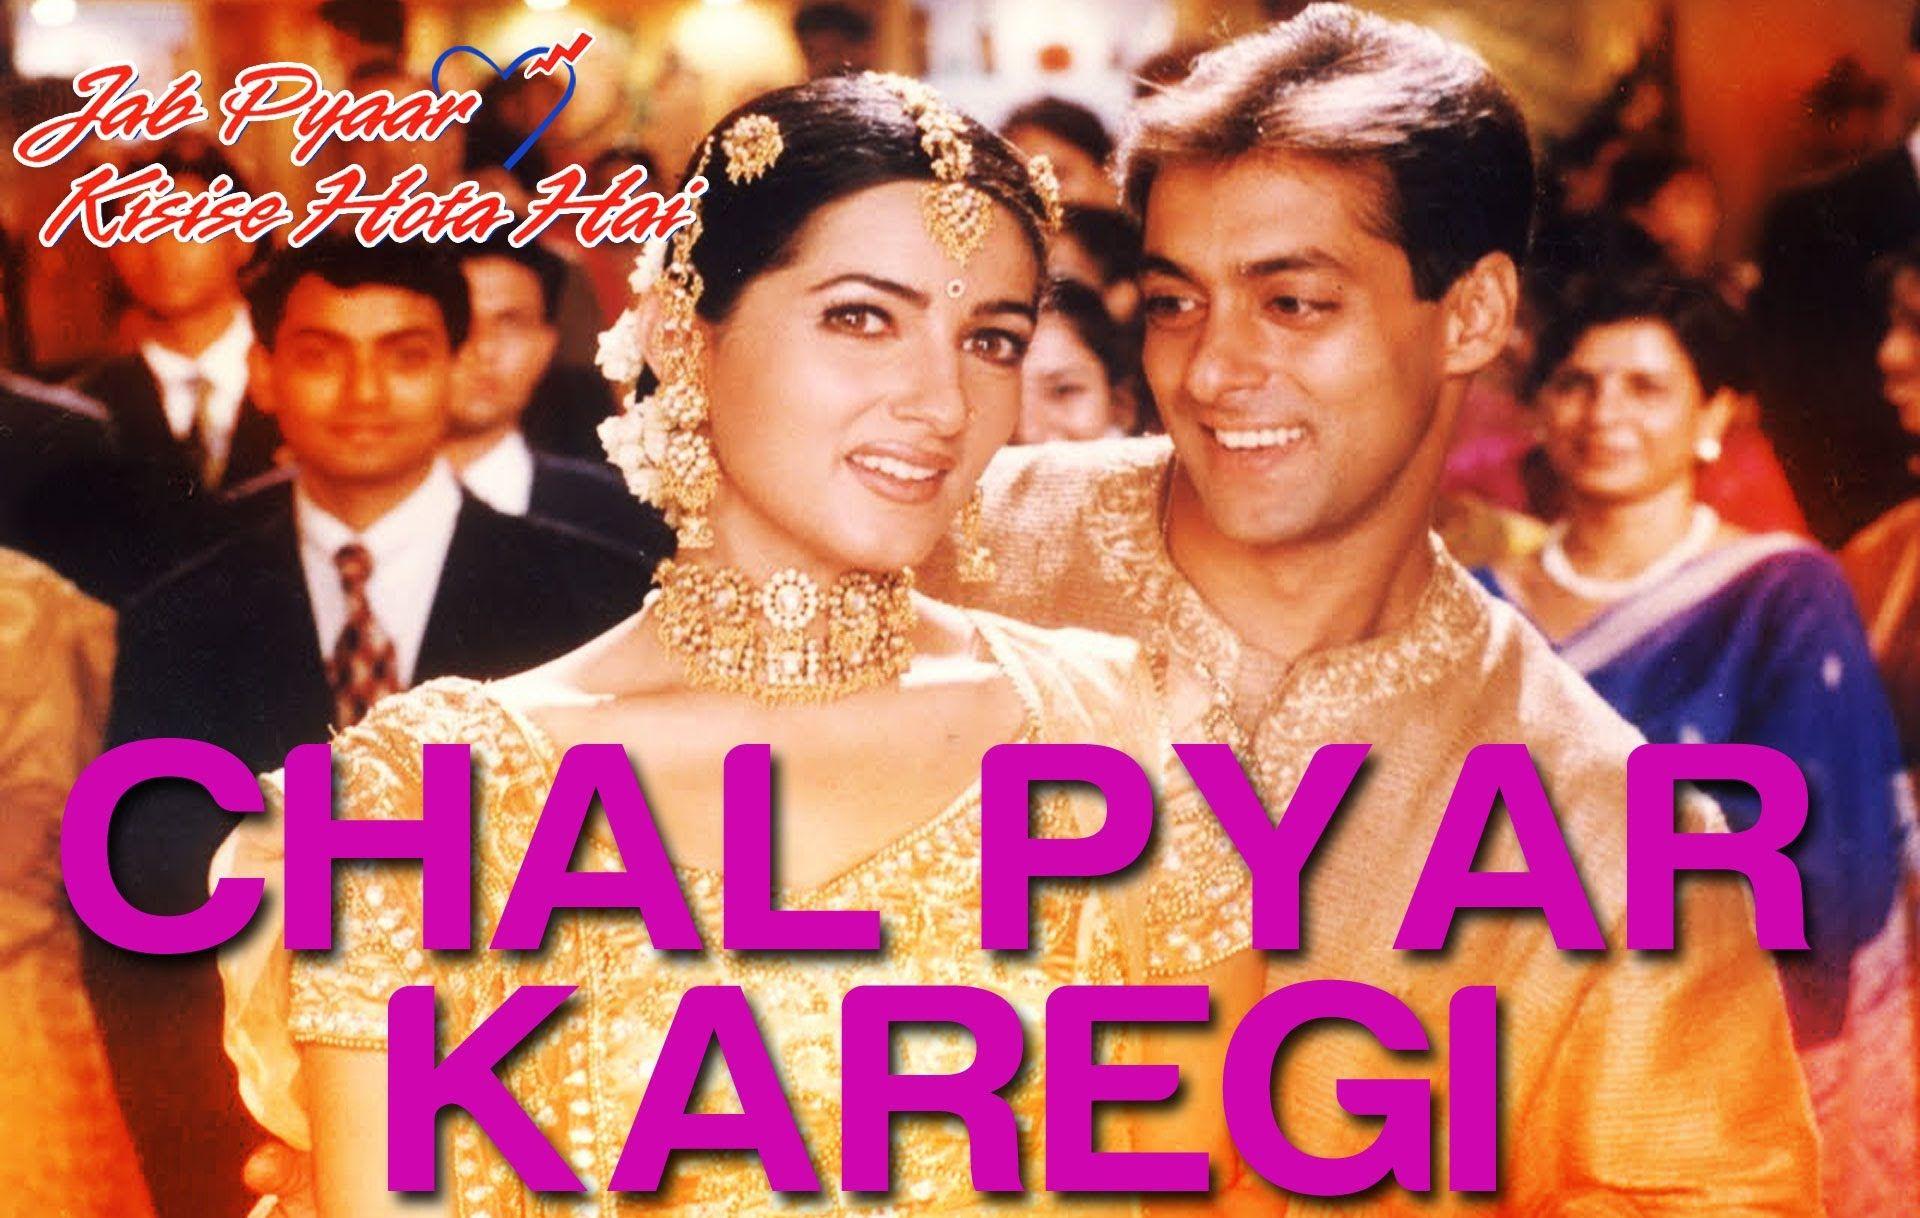 Chal Pyar Karegi Jab Pyaar Kisise Hota Hai Salman Khan Twinkle S Bollywood Songs Songs For Dance Indian Wedding Songs